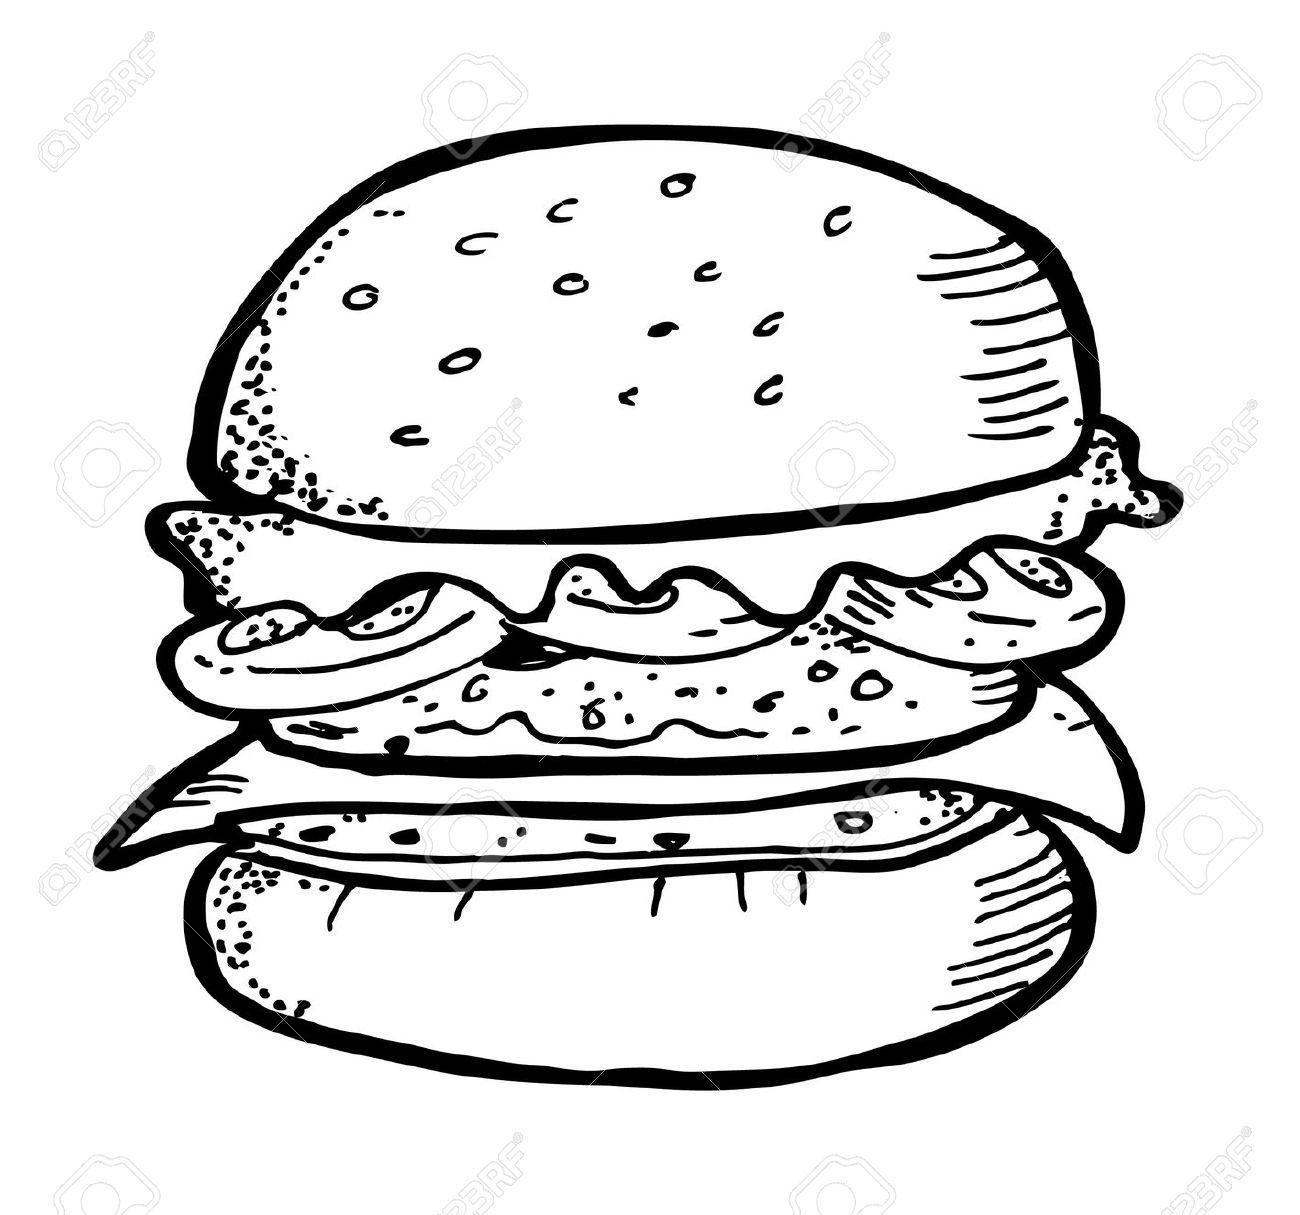 cheeseburger line art graphics Google Search